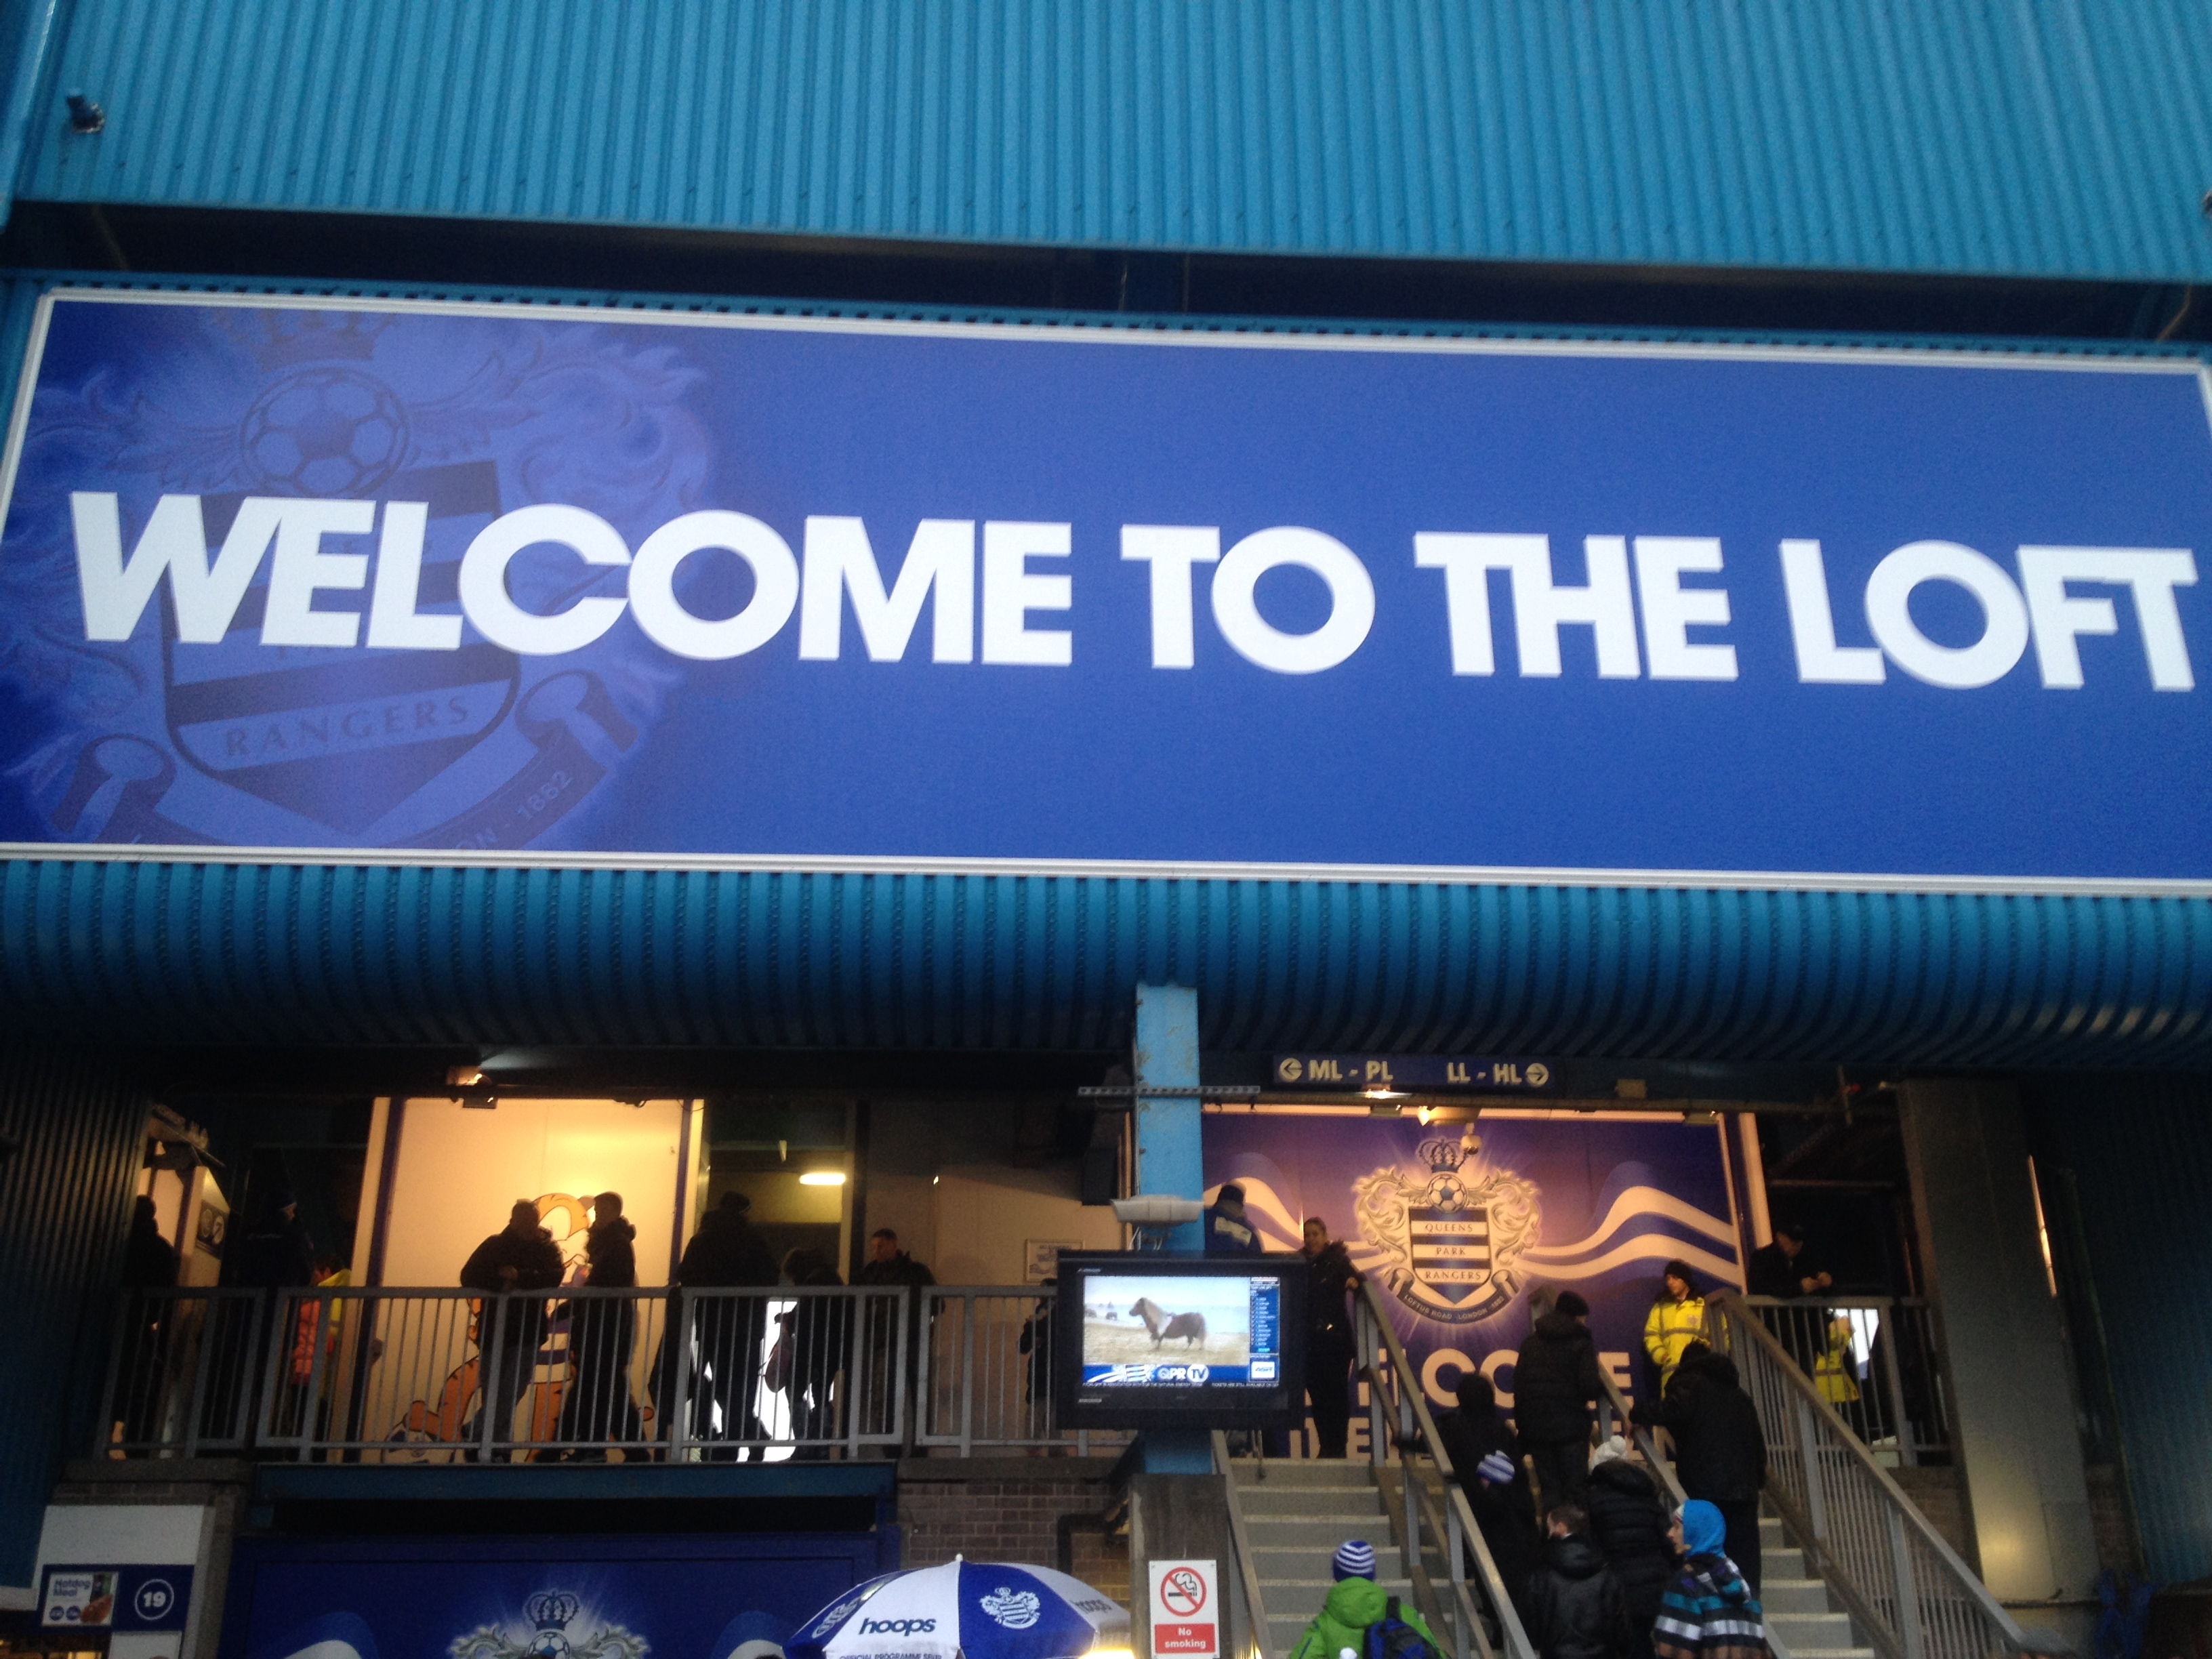 Walking into the stadium